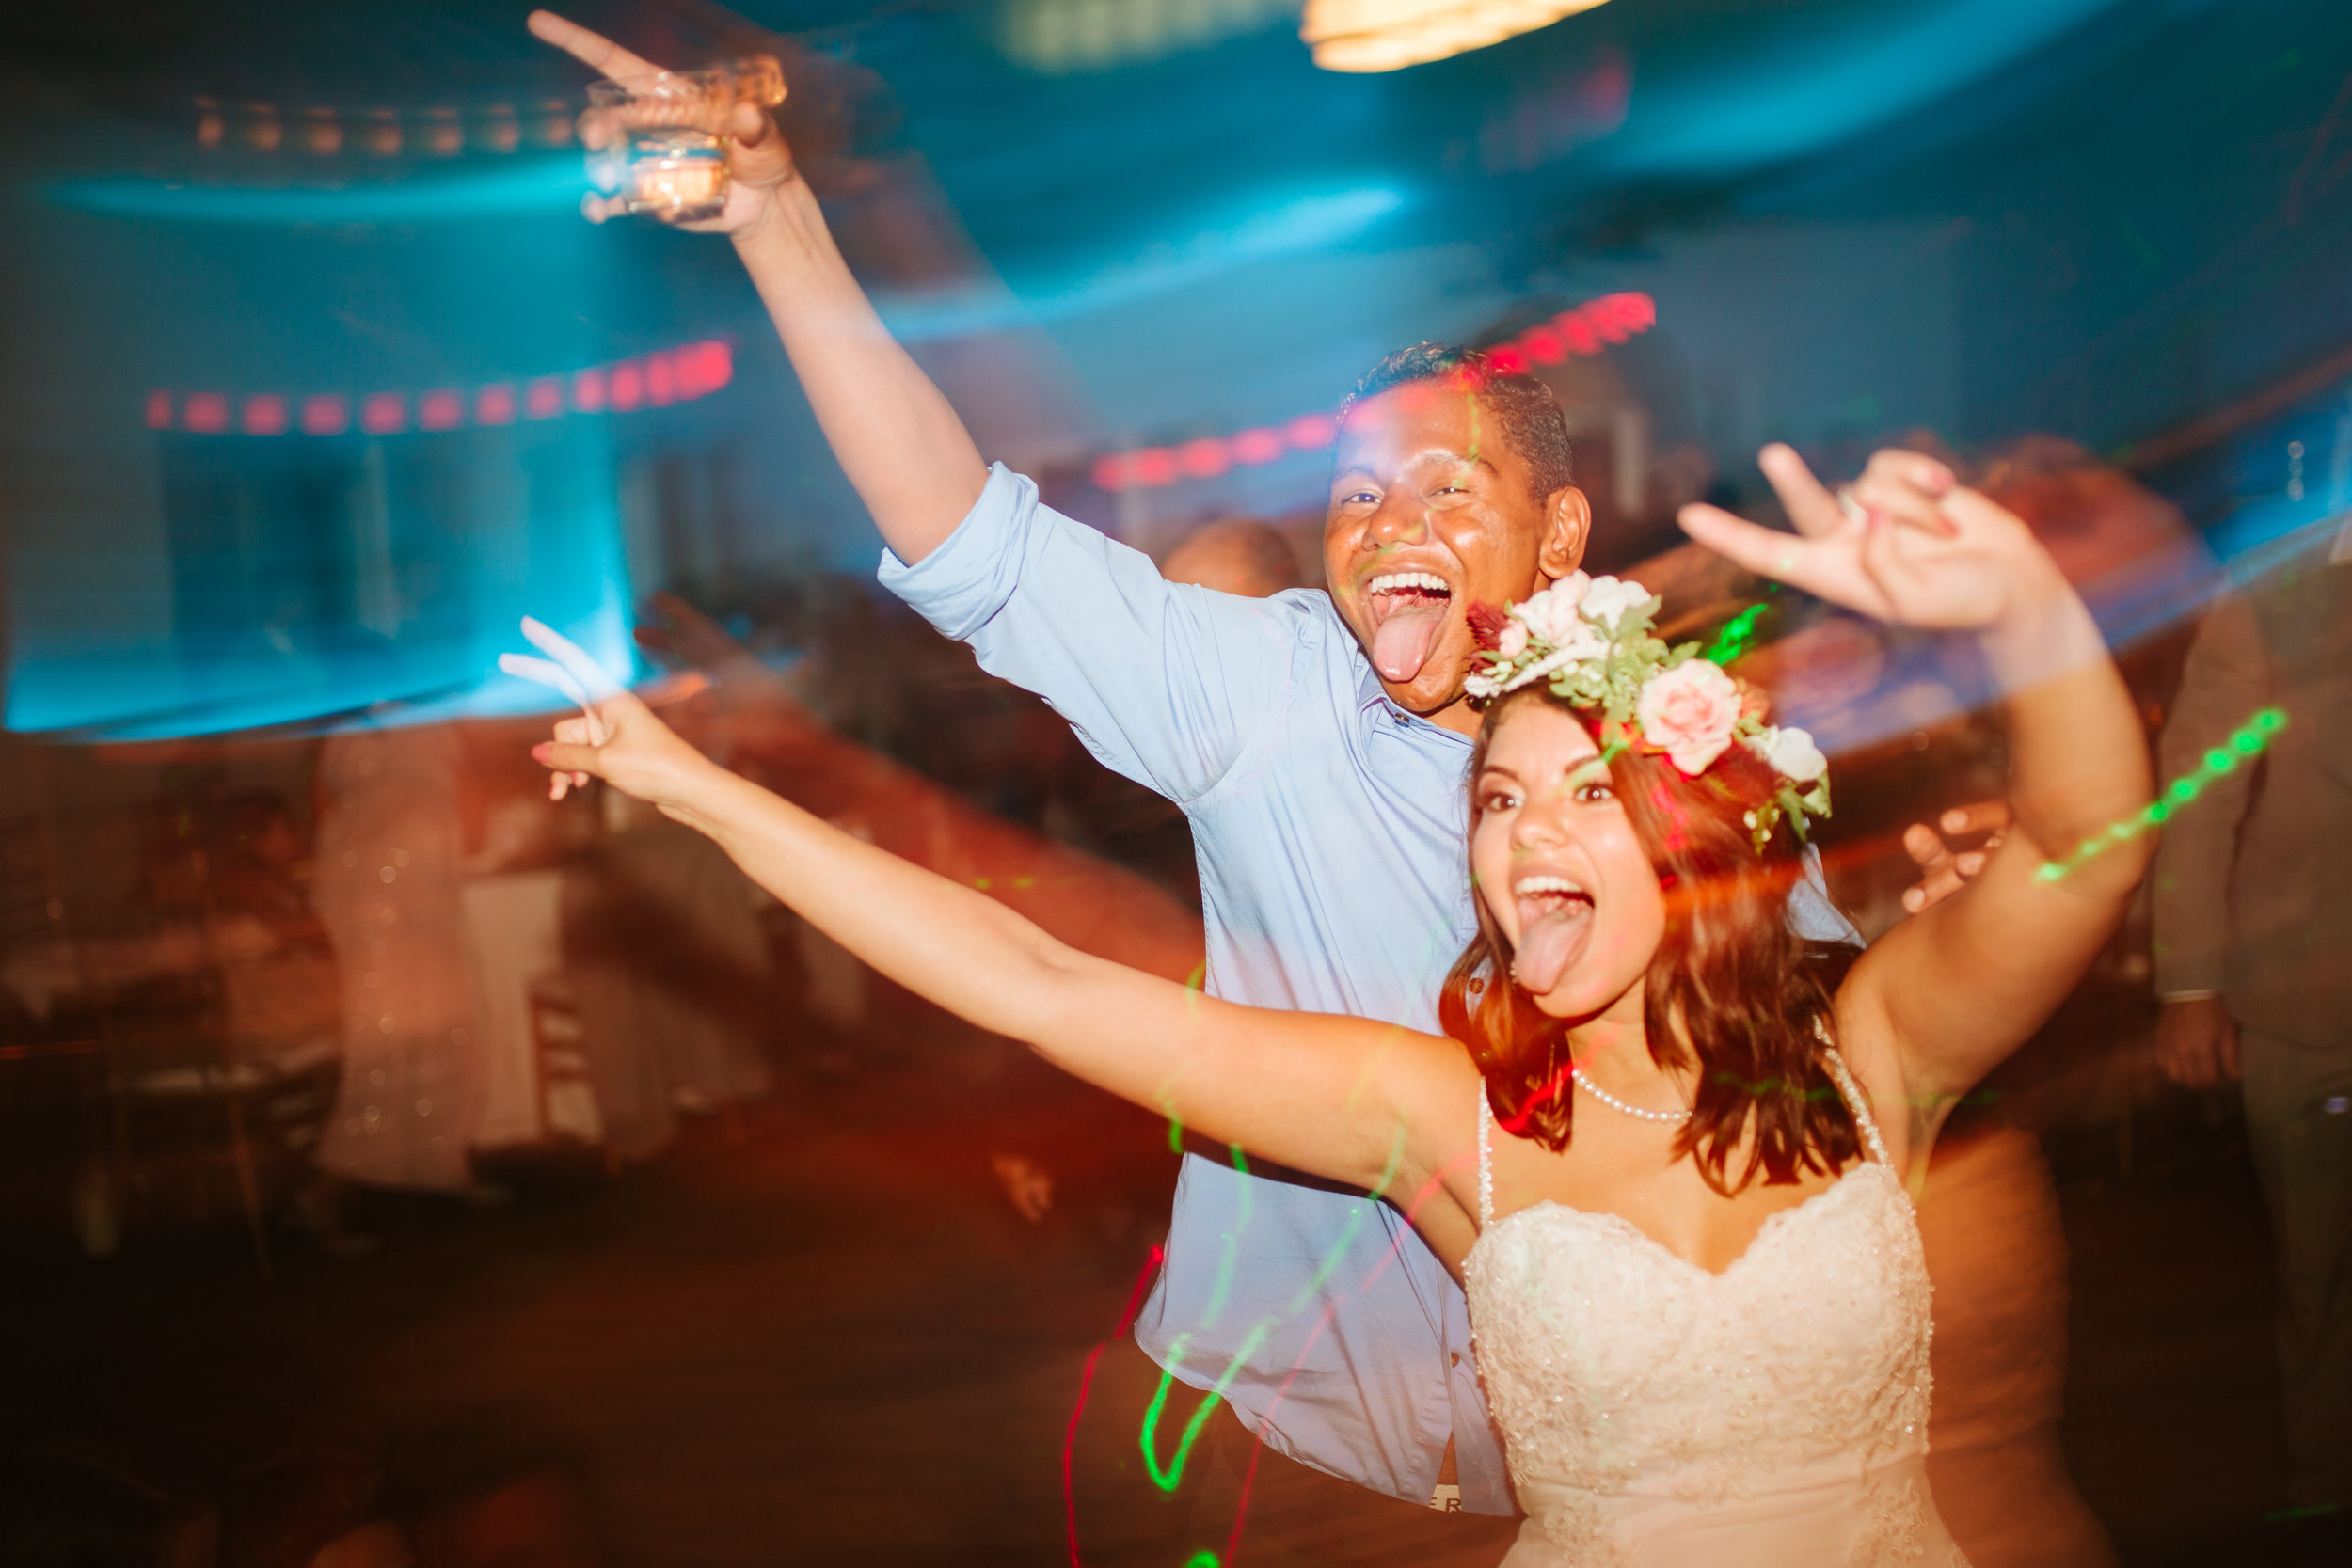 2017.05.23 Barbara and Mauricio Sales Port St Lucie Wedding (713 of 772).jpg